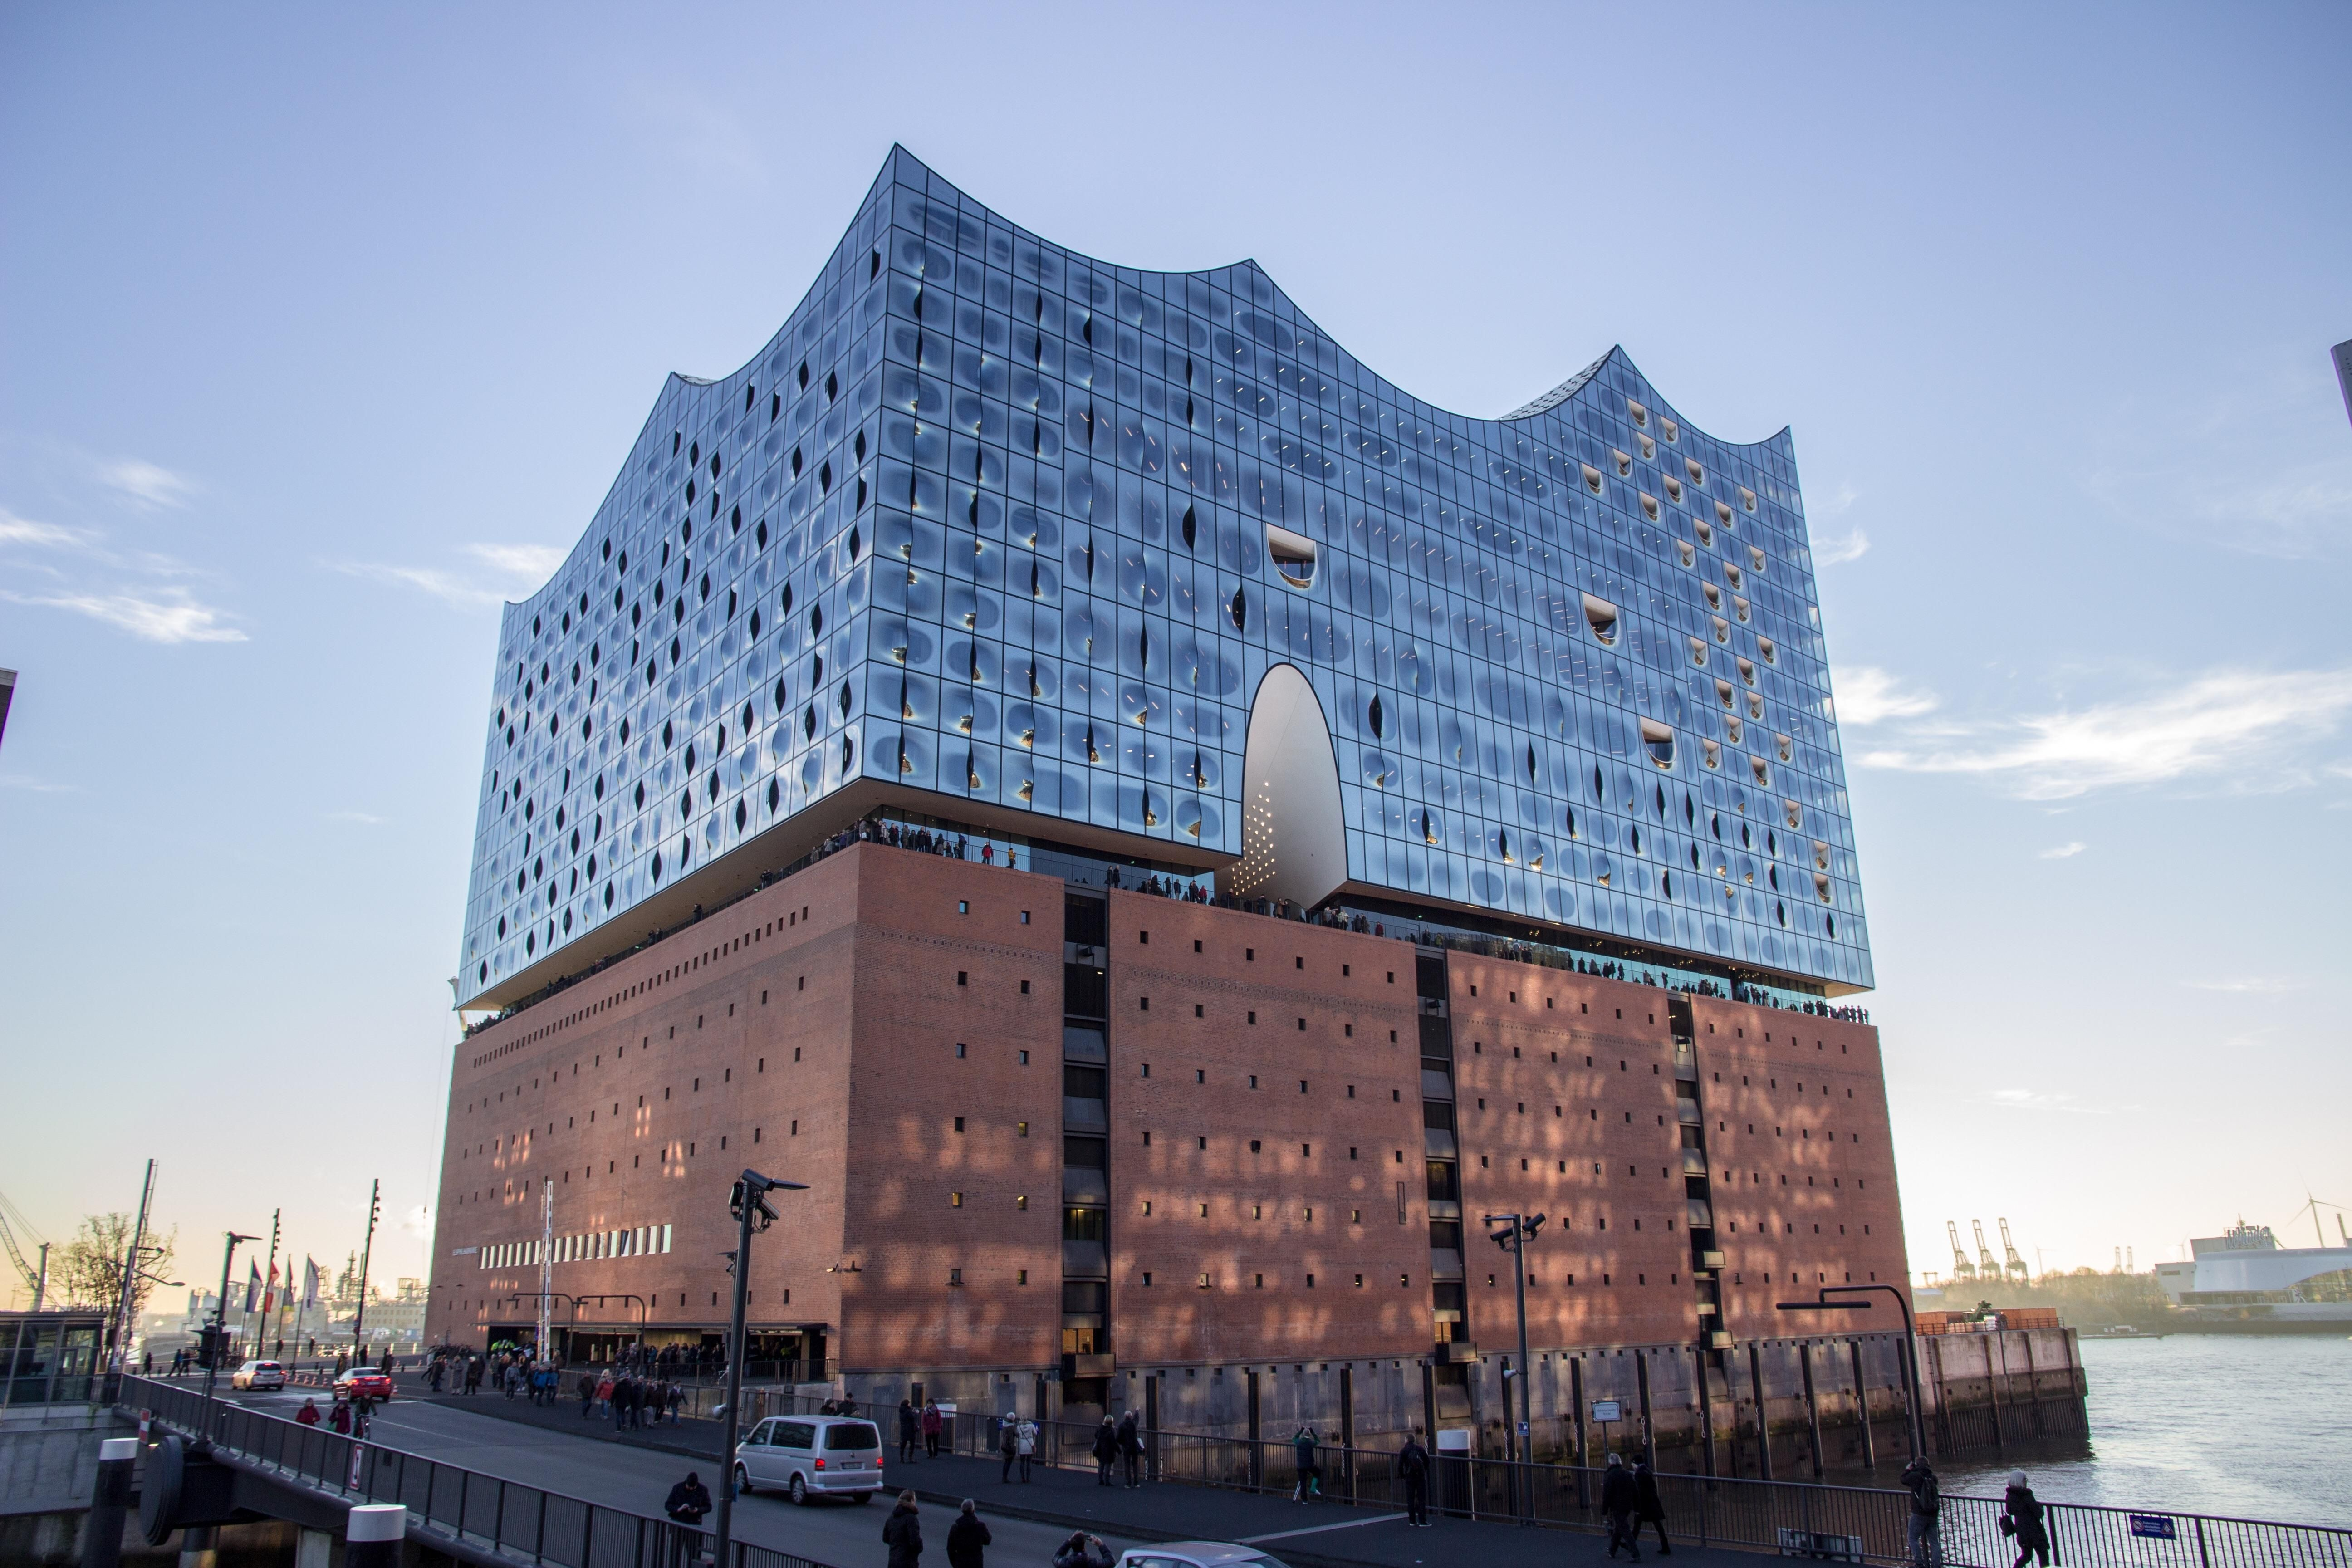 Elbphilharmonie Hamburg Germany Building Architecture Building Landmarks